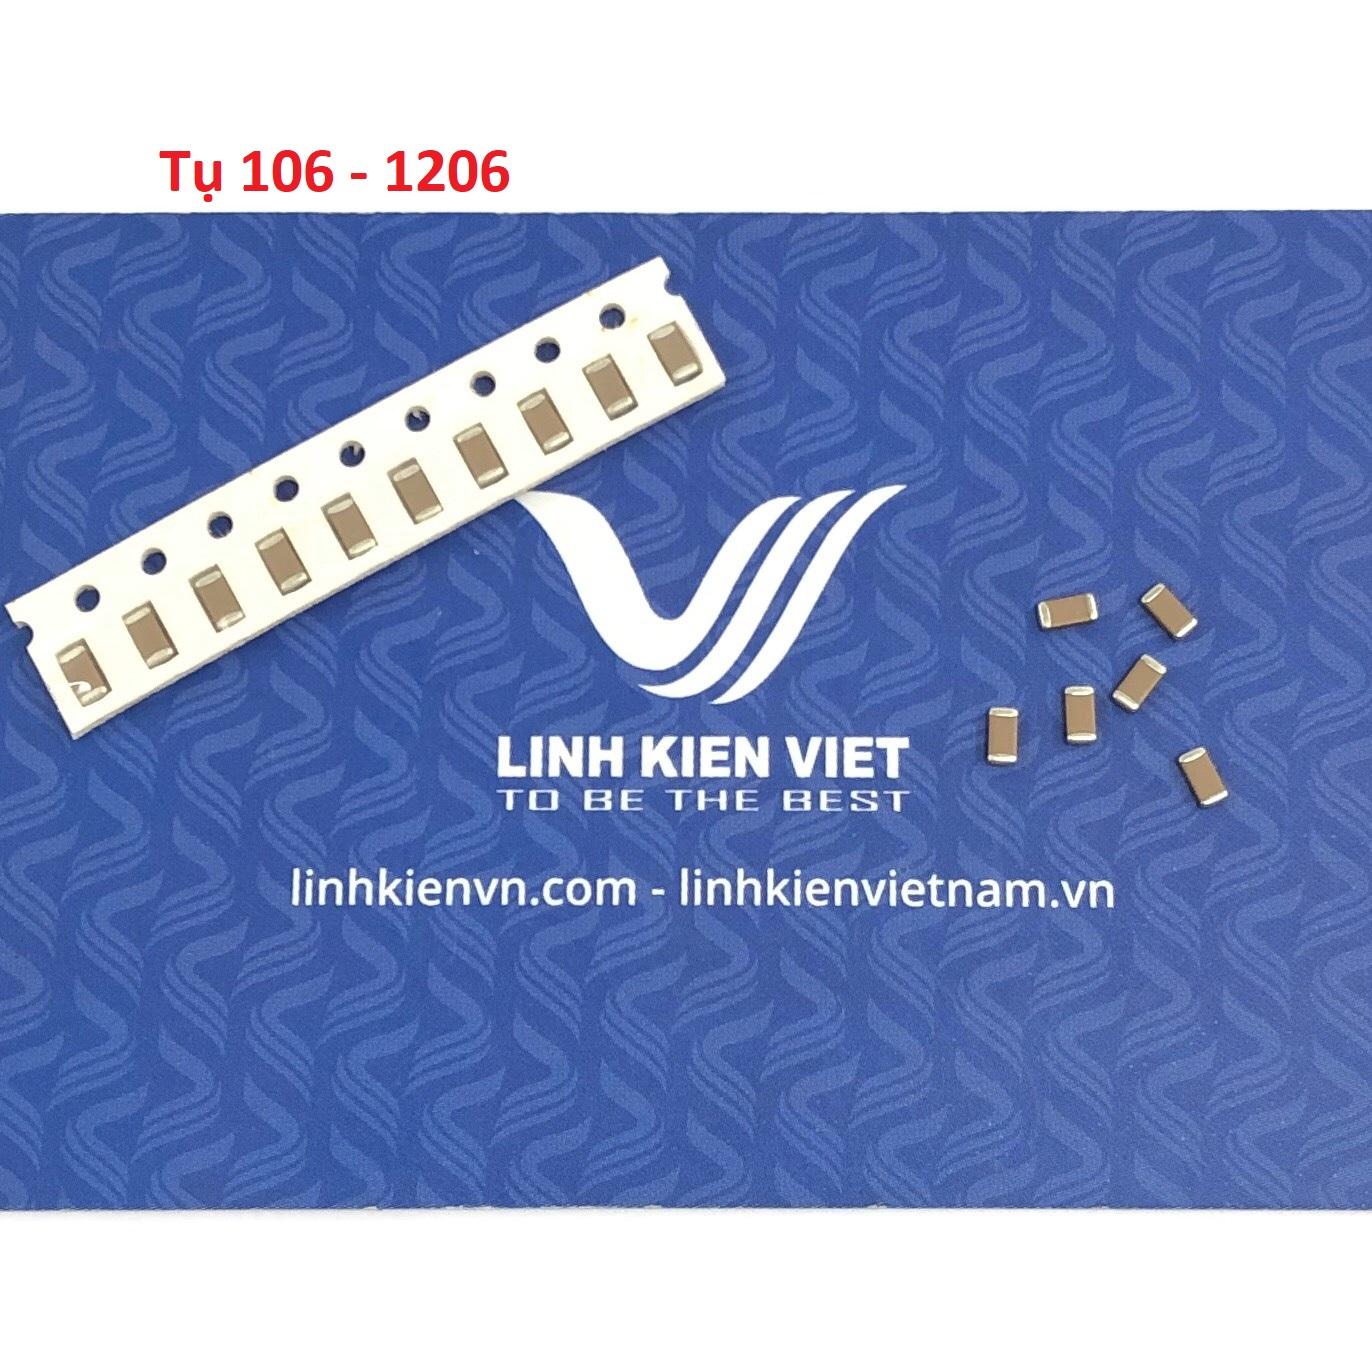 Tụ SMD 106 10uF 1206 - 10 con